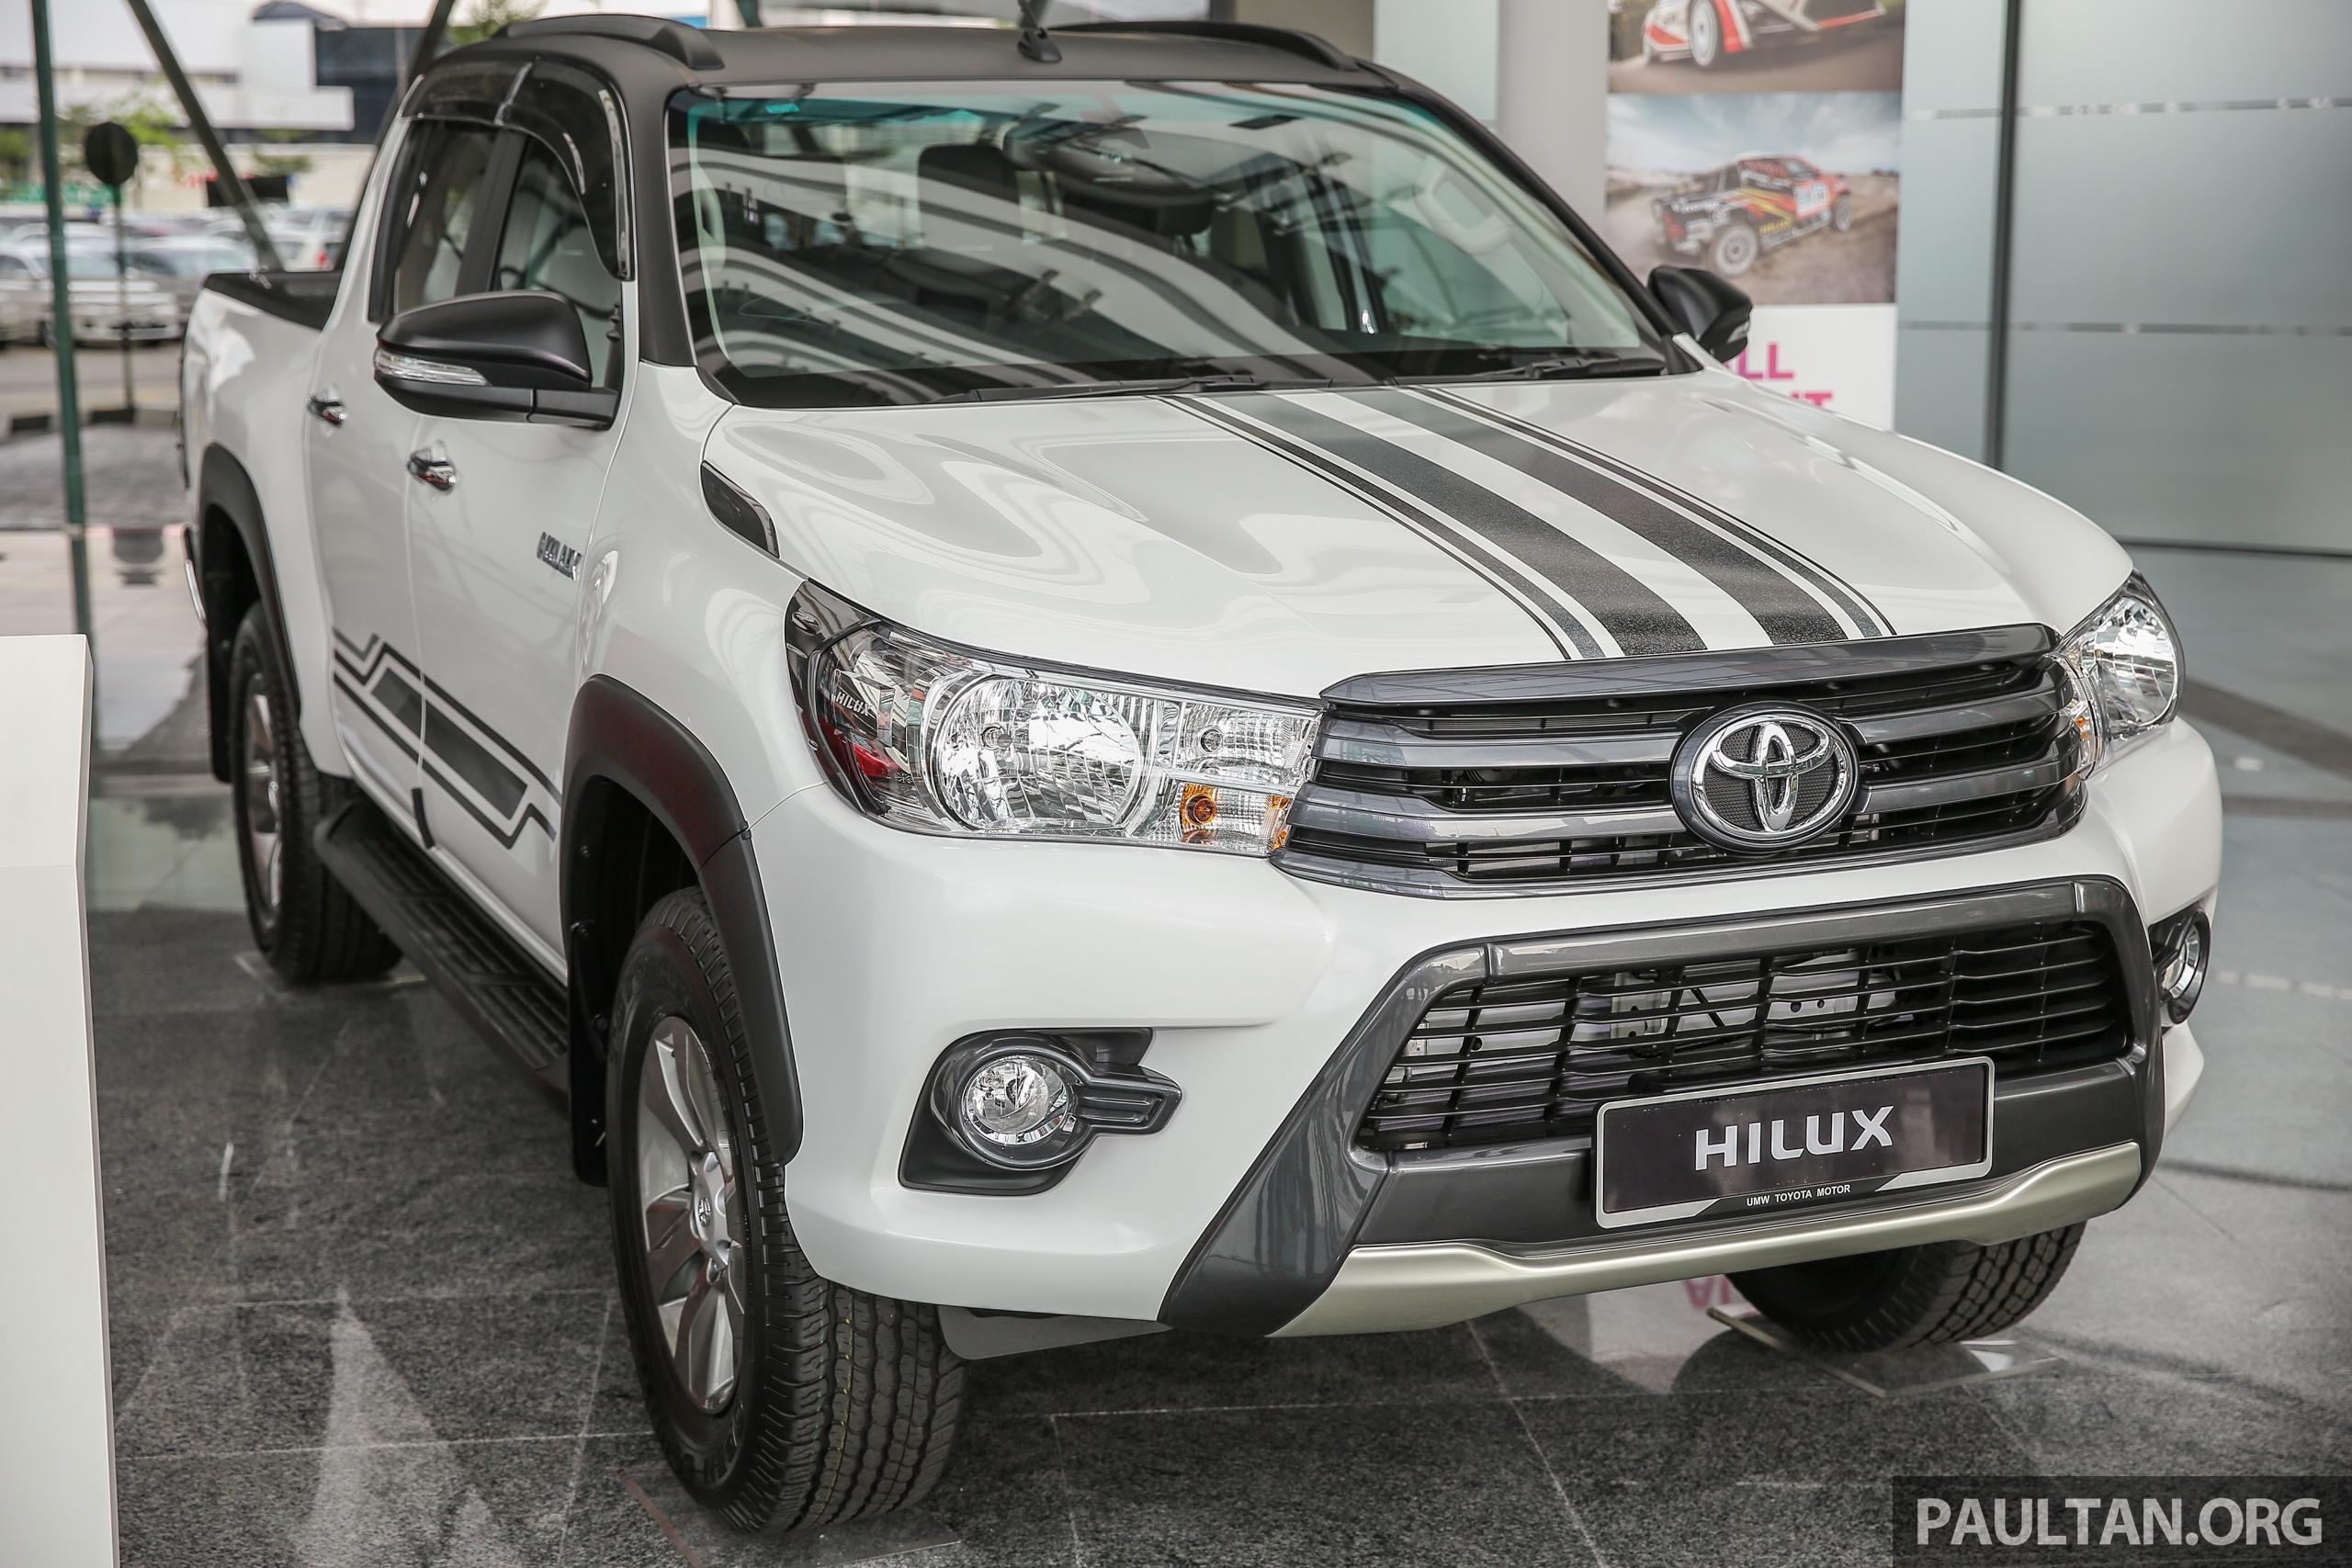 Toyota Hilux 2017 Philippines